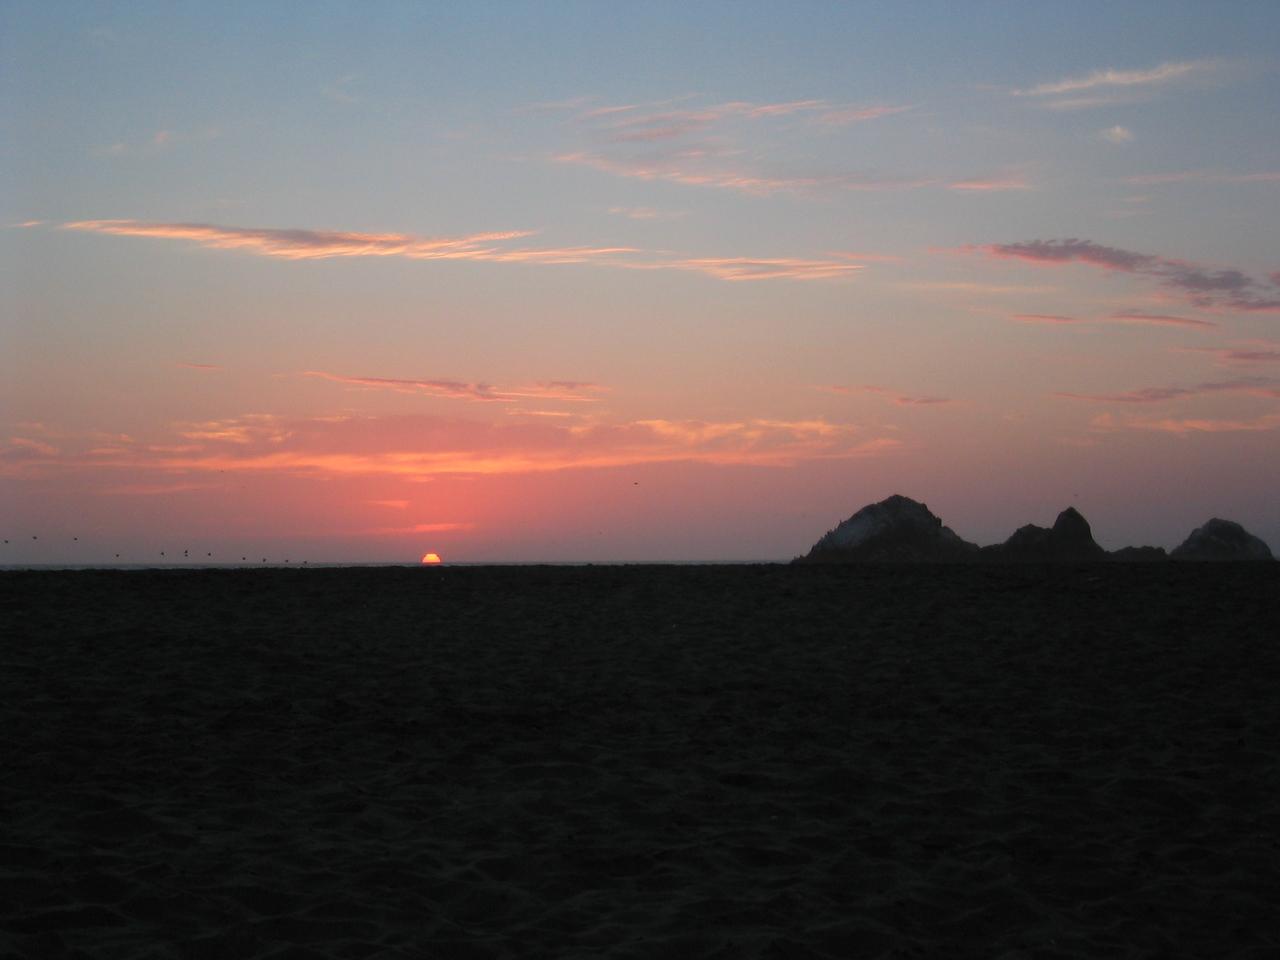 Sunset - dark